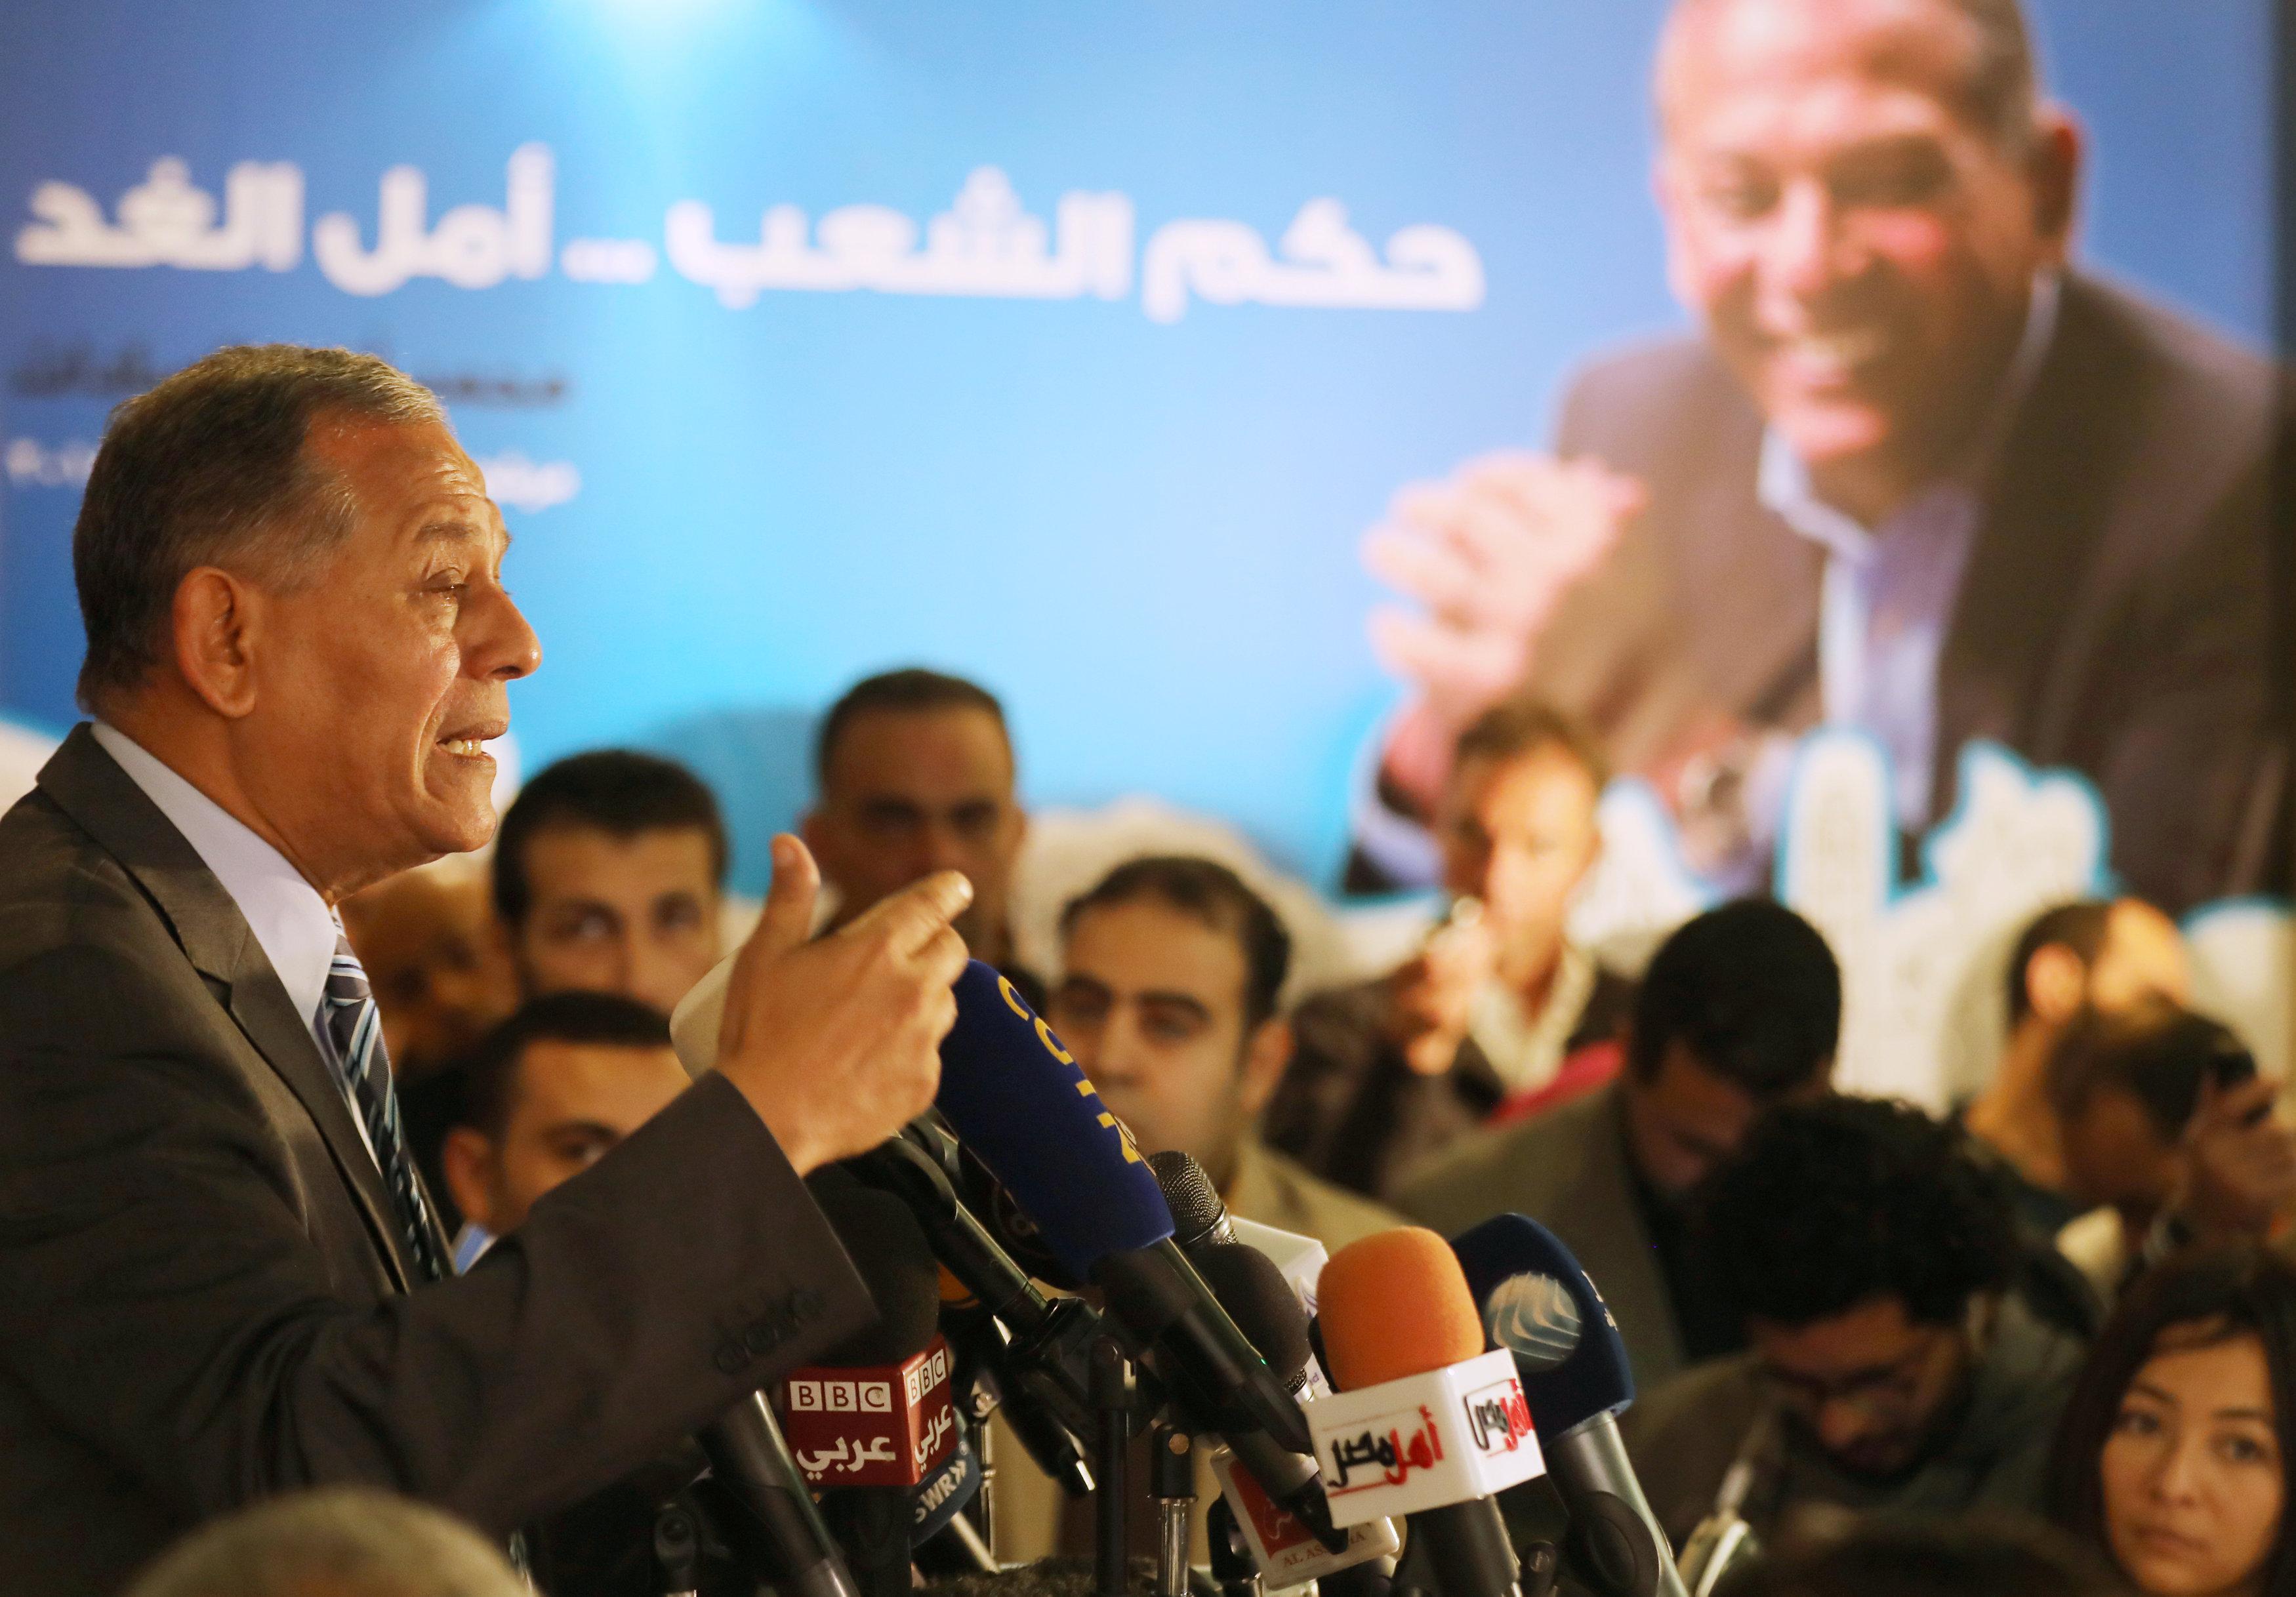 Egypt too repressive for election bid, says ex-president Sadat's nephew